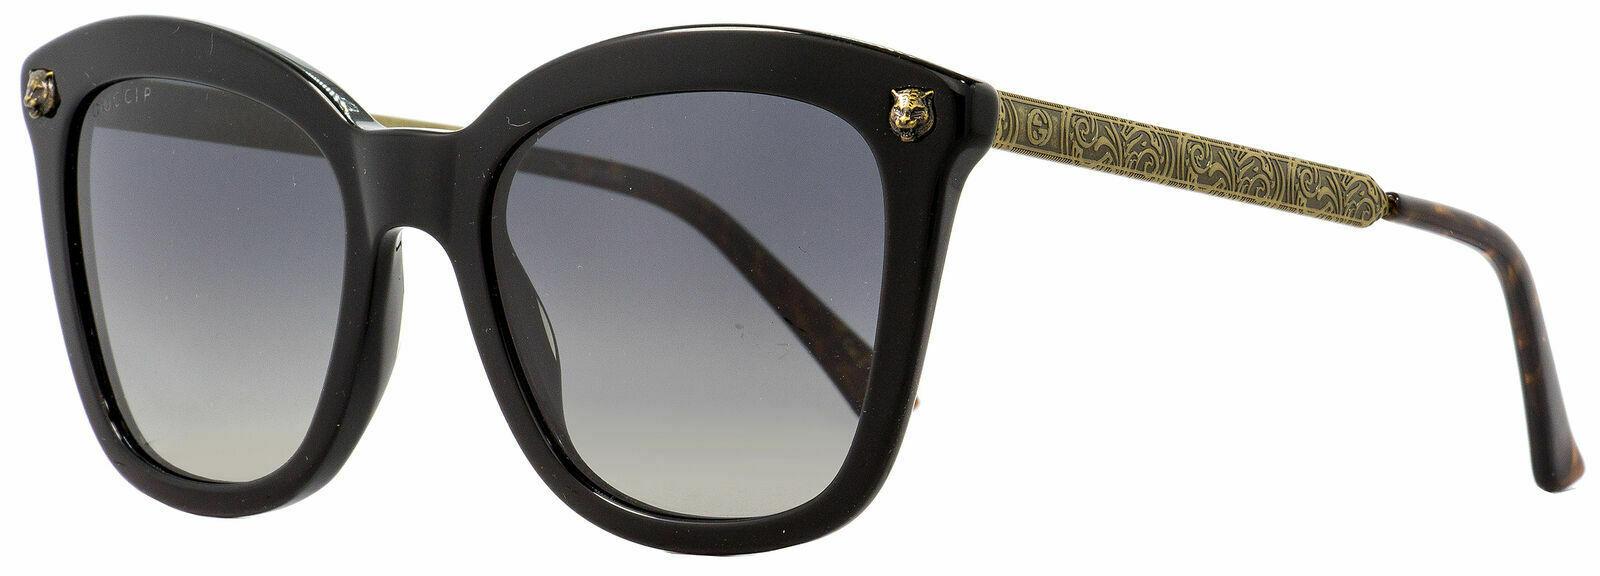 ae39c2a90 Gucci Cateye Sunglasses GG0217S 006 Black/Antique Gold Polarized 52mm 0217  - $445.50